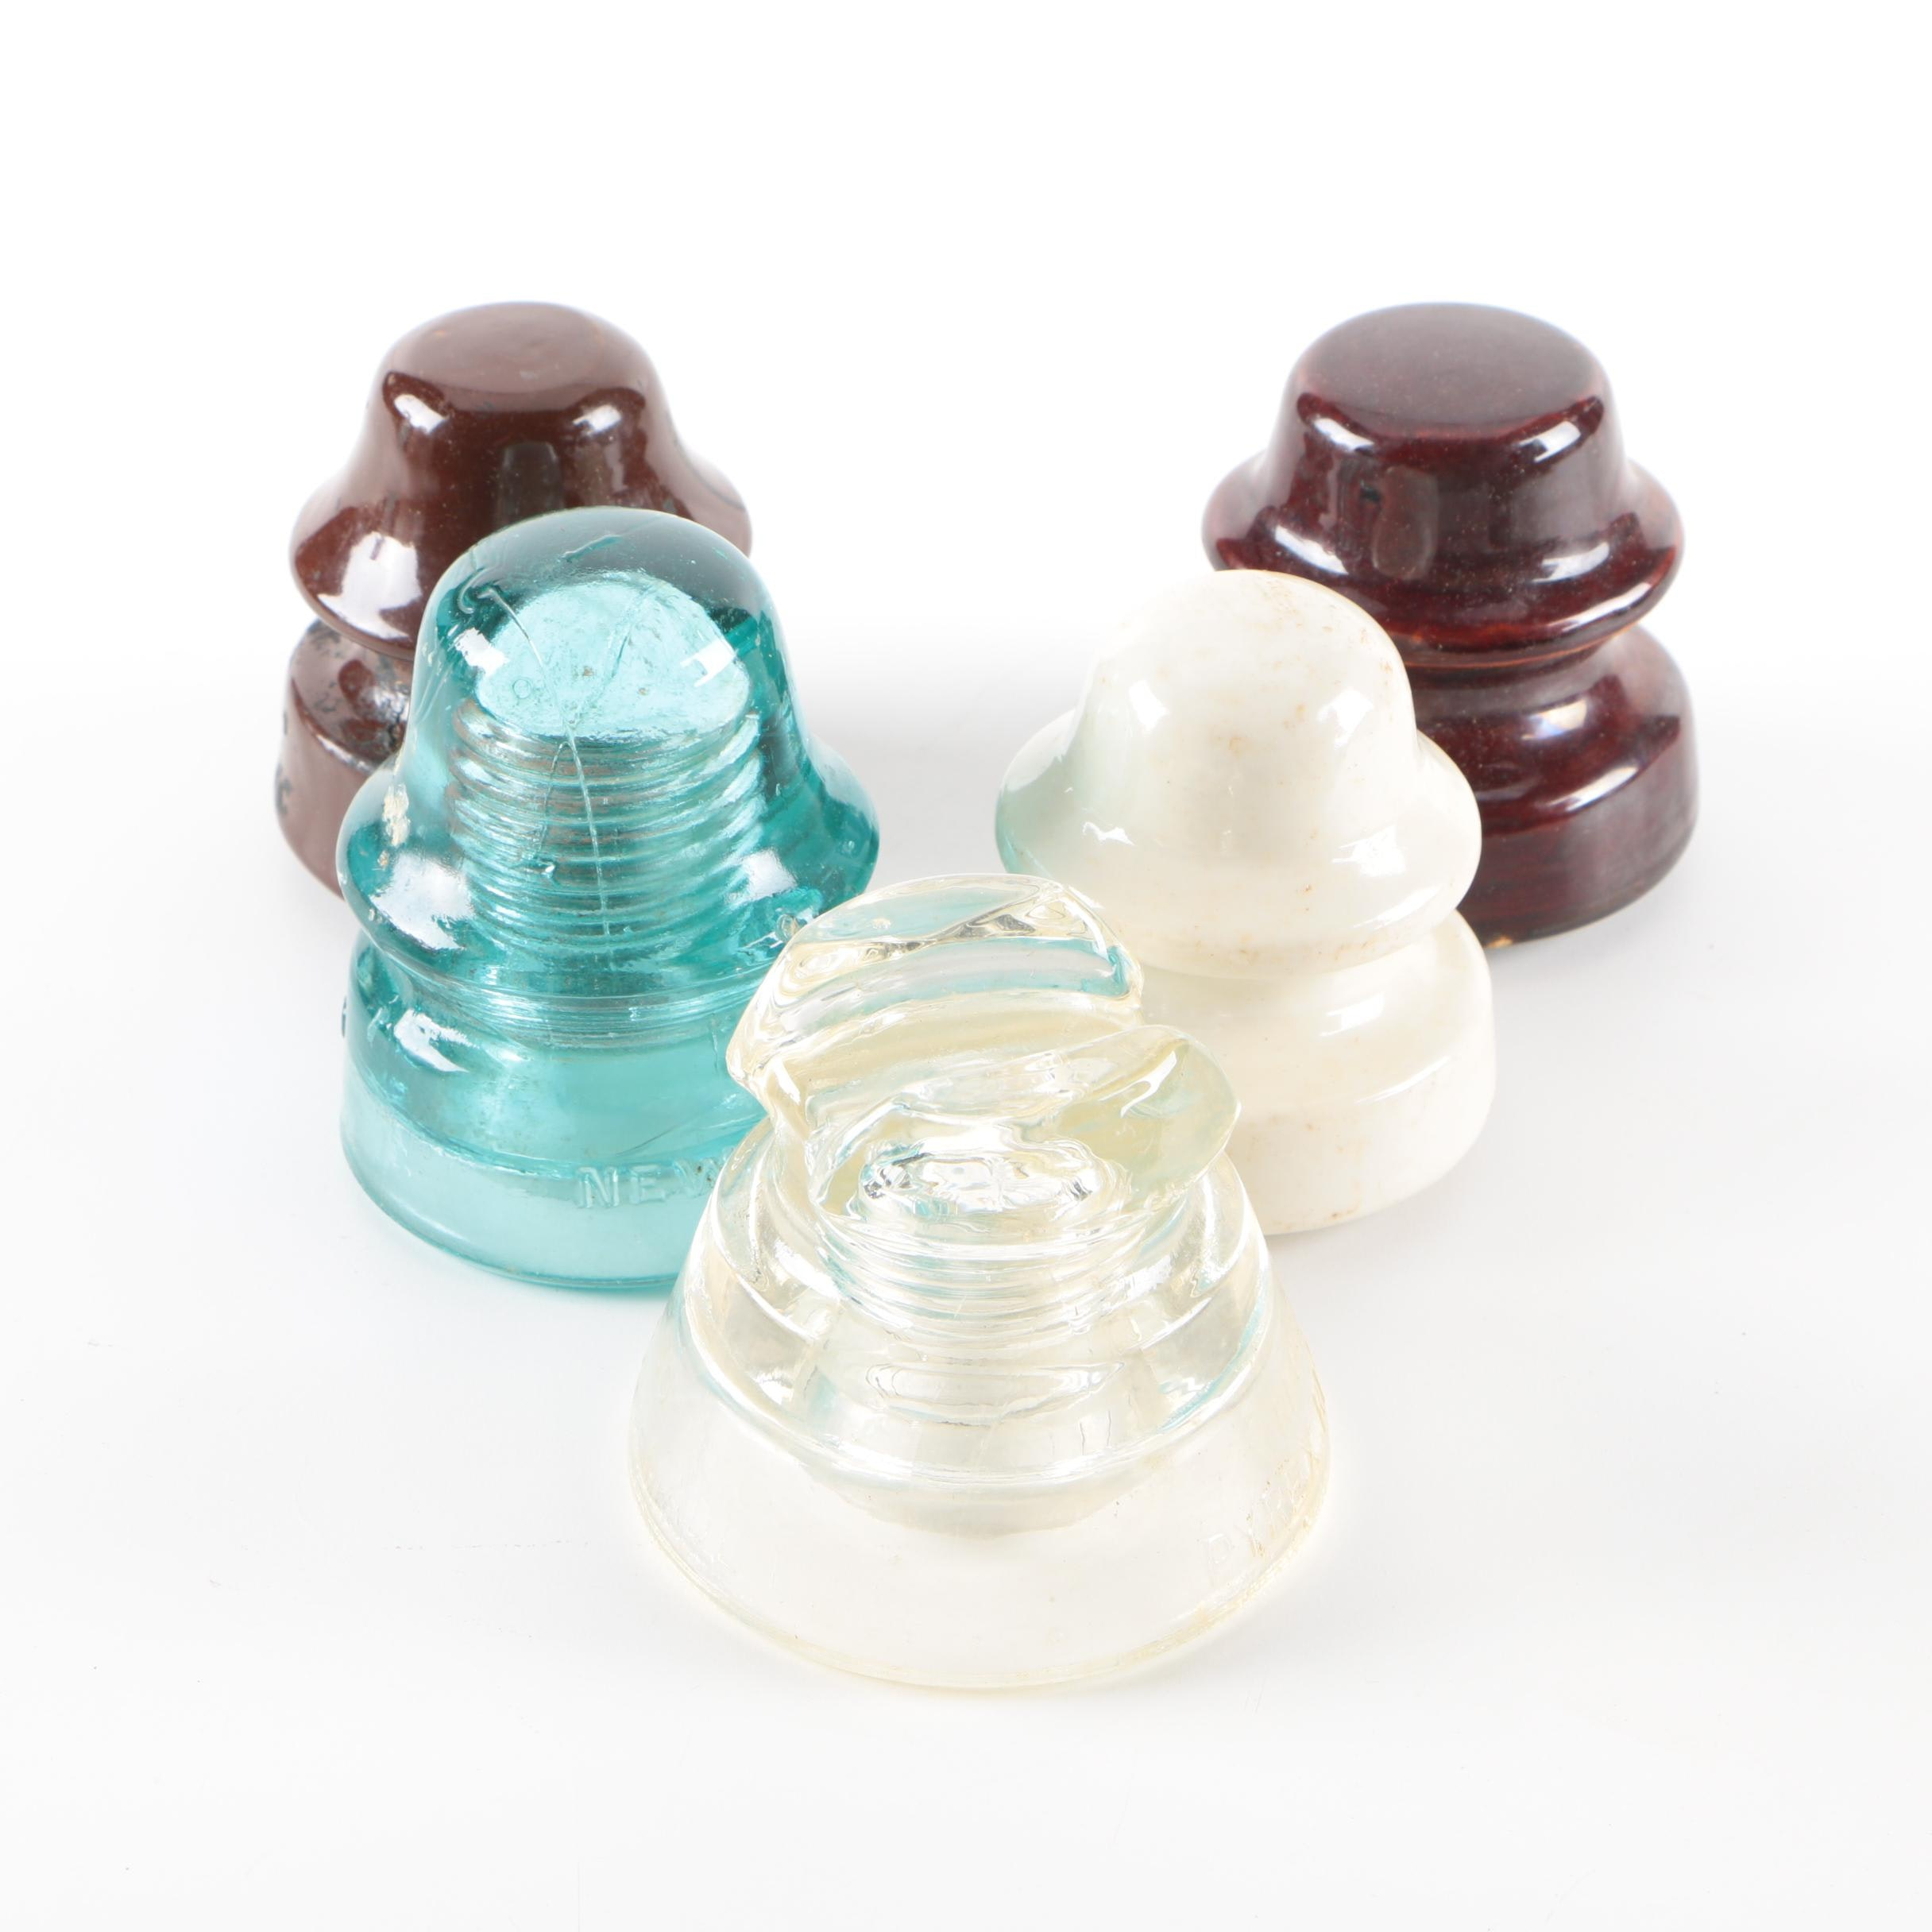 Vintage Glass and Ceramic Insulators